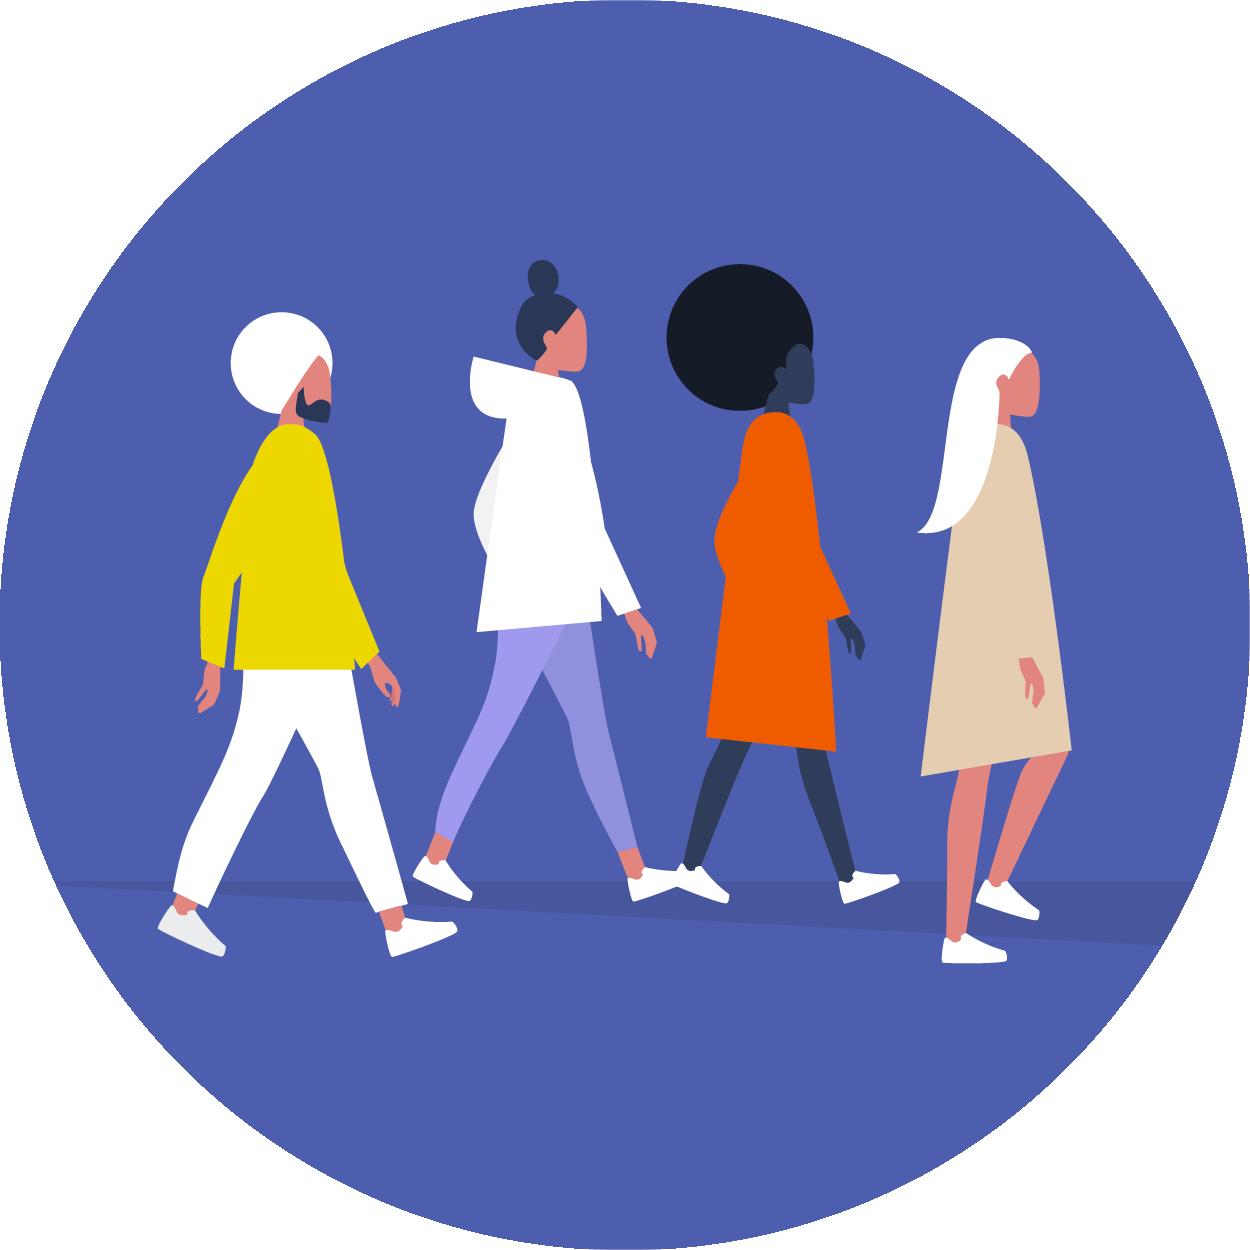 Join a community walk